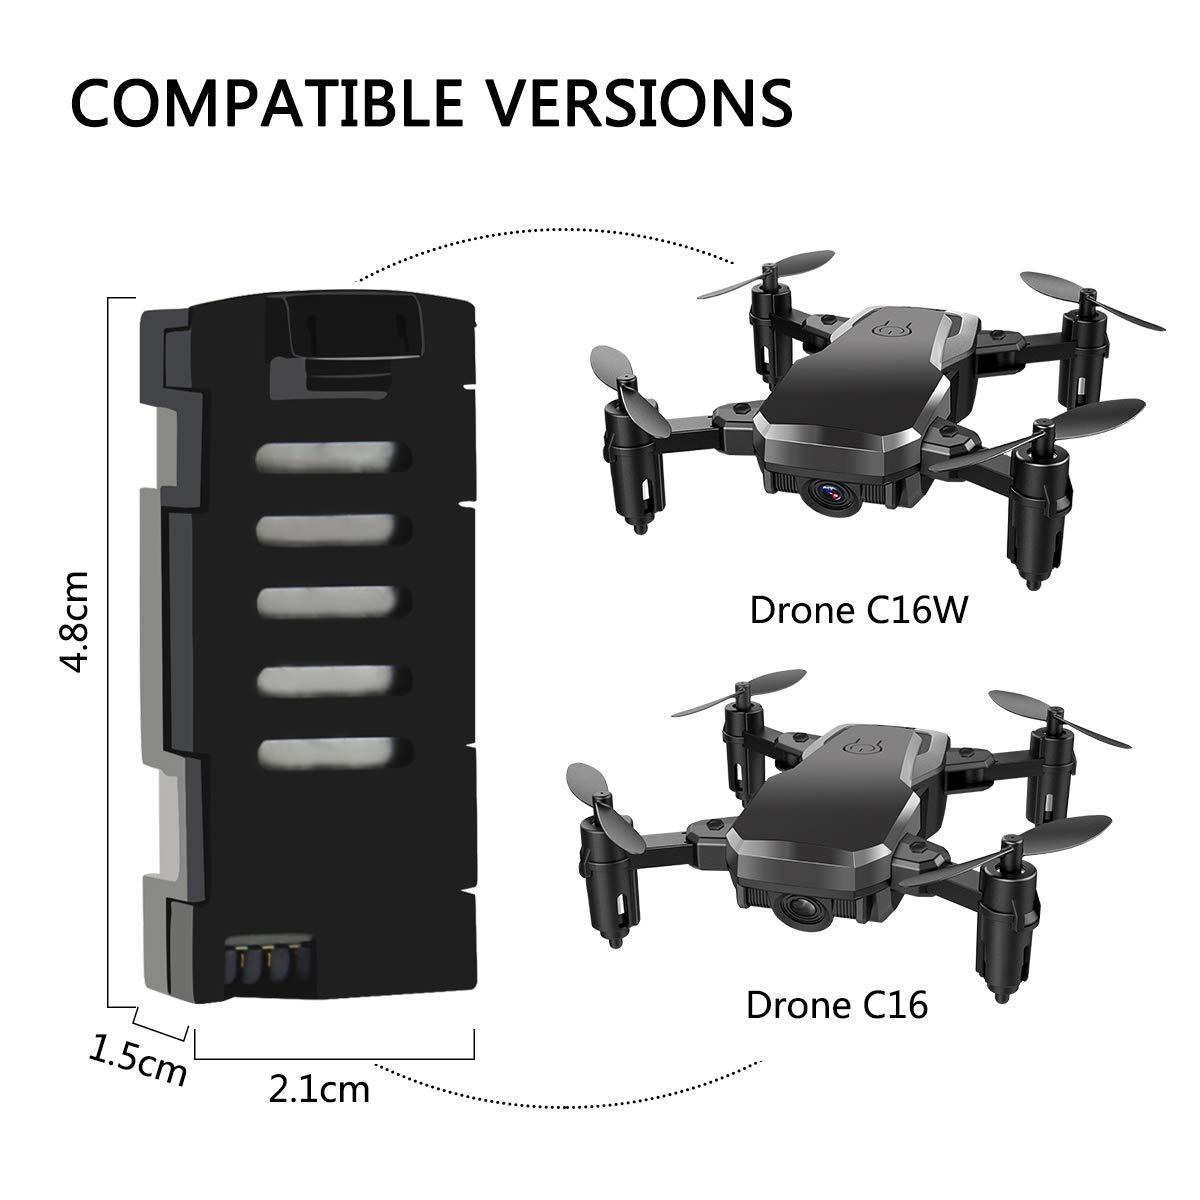 Conthfut Drone Baterias Drone C16, C16W, Batería LiPo 3.7V 500mAh ...